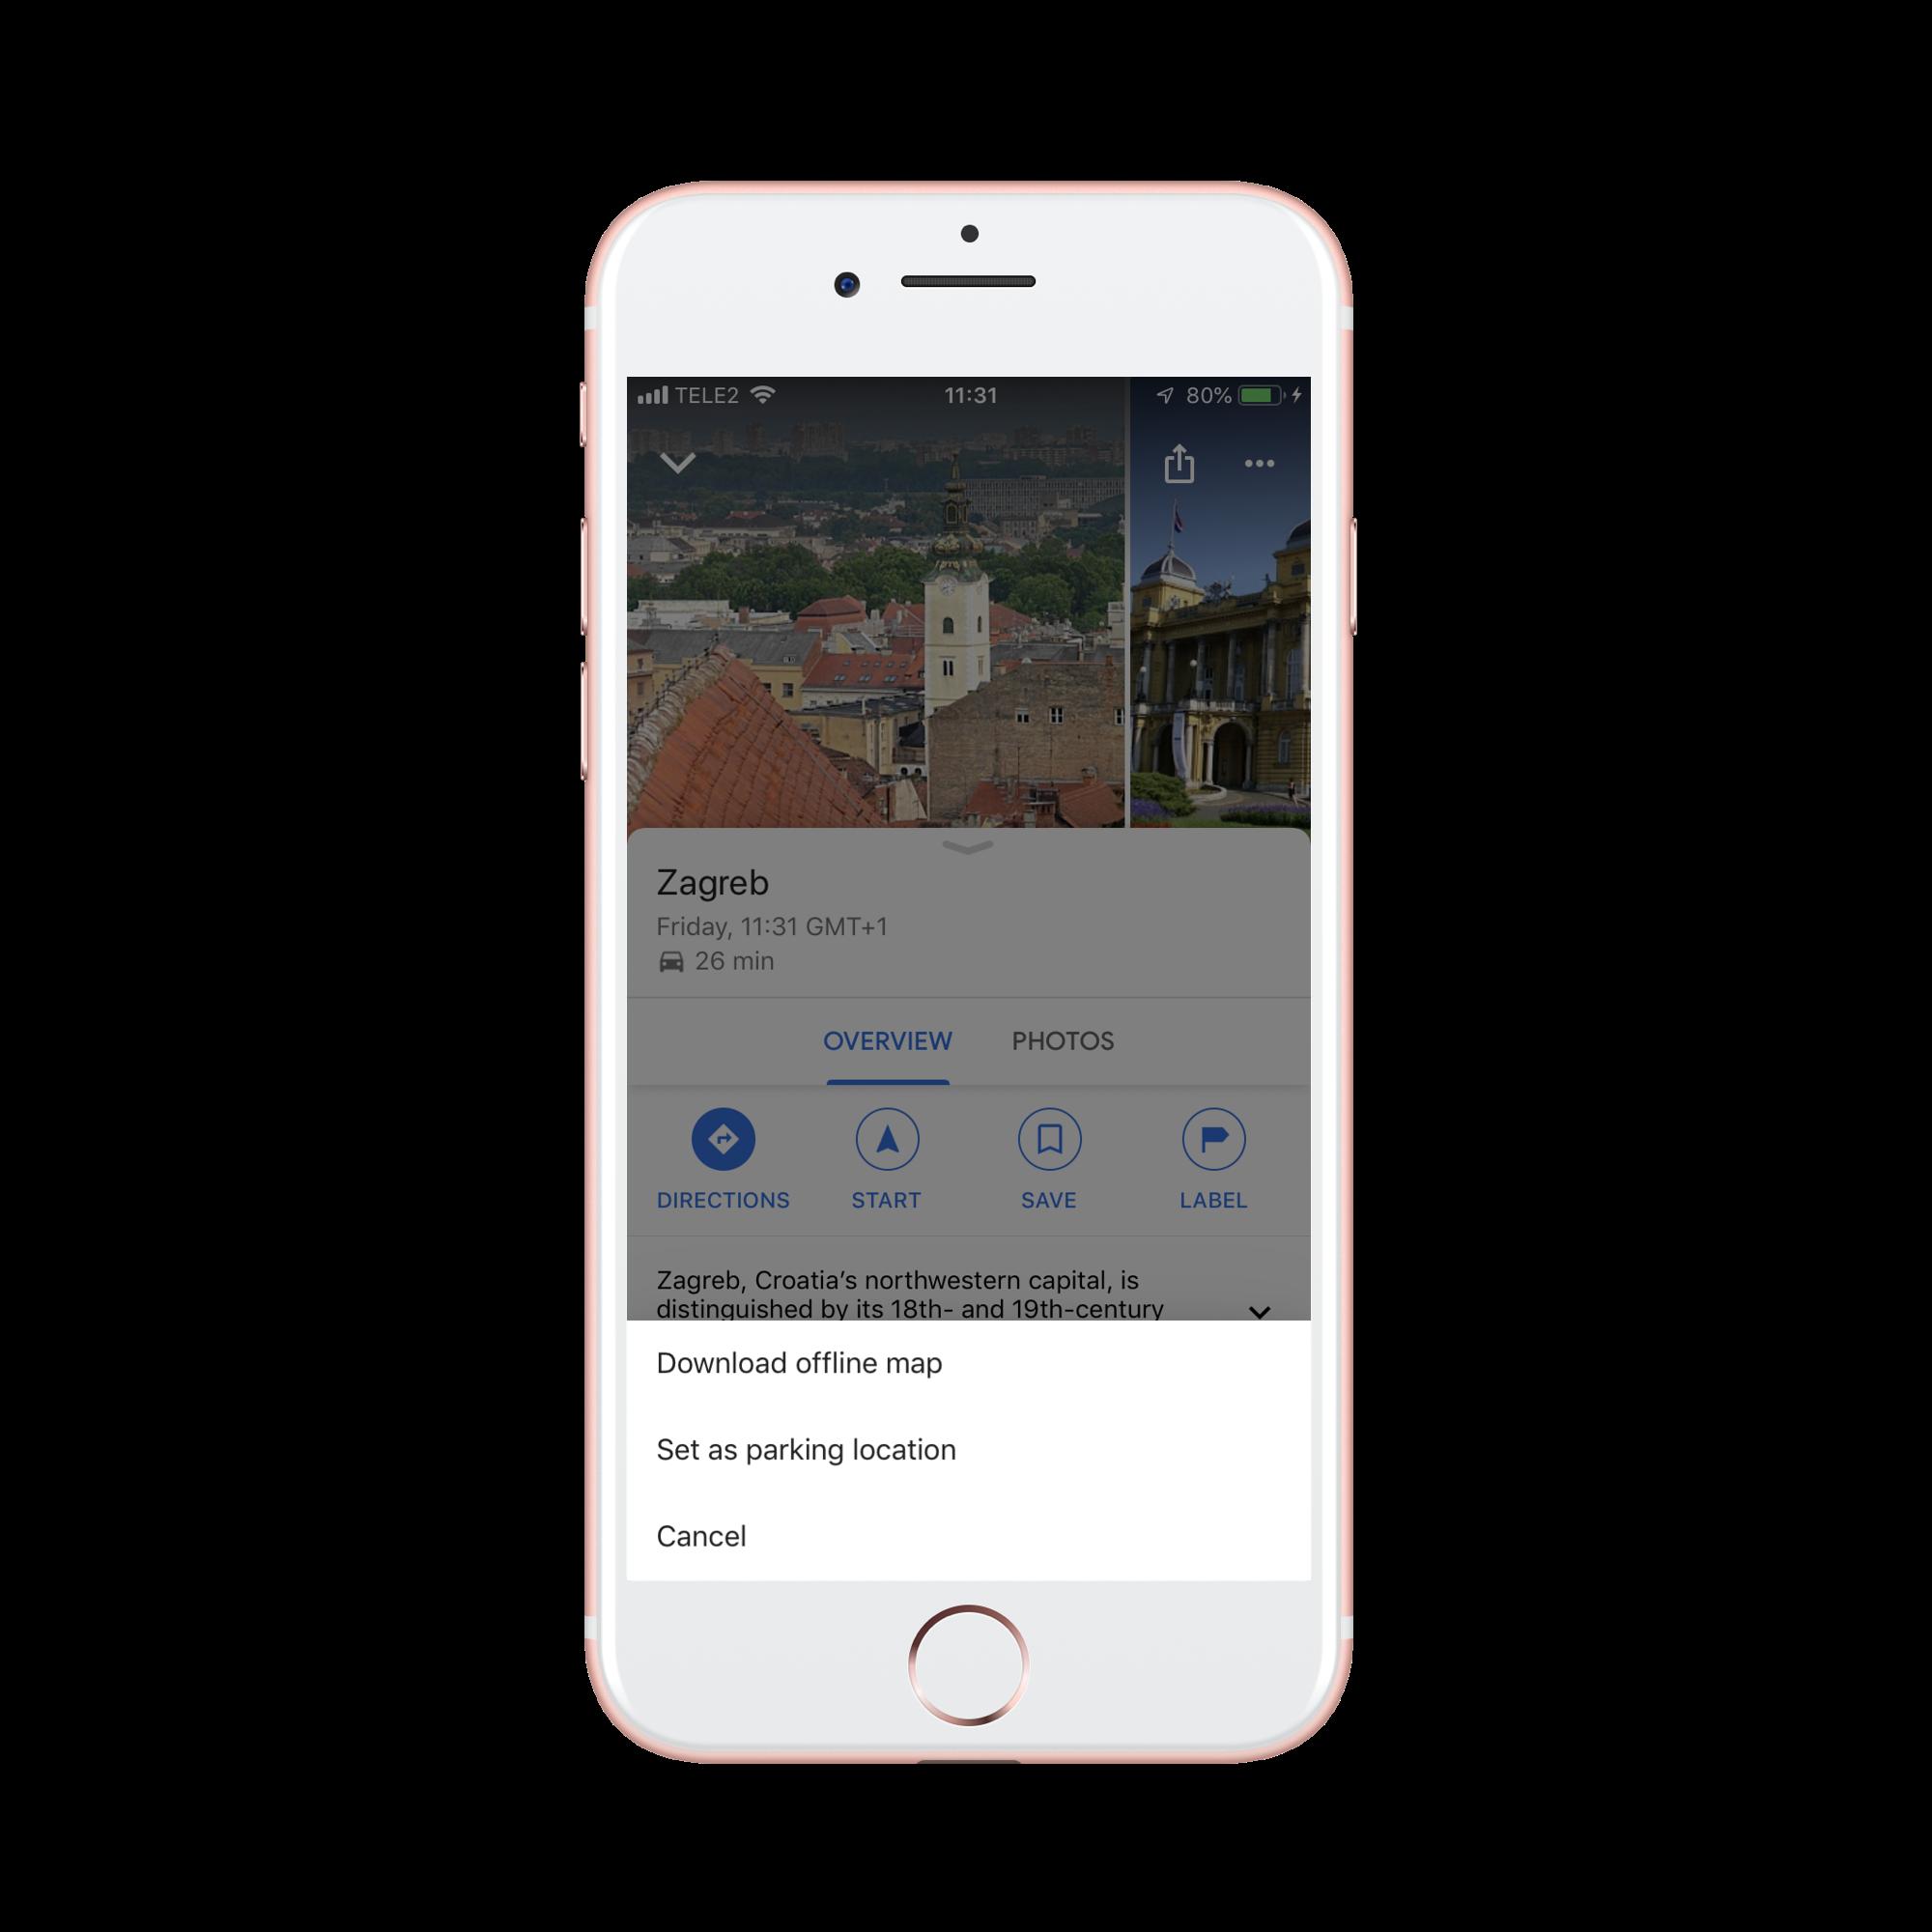 How to download offline Google maps - Amazy Daisy Google Map Download For Mobile on download london tube map, download icons, download business maps, online maps, download bing maps, topographic maps,